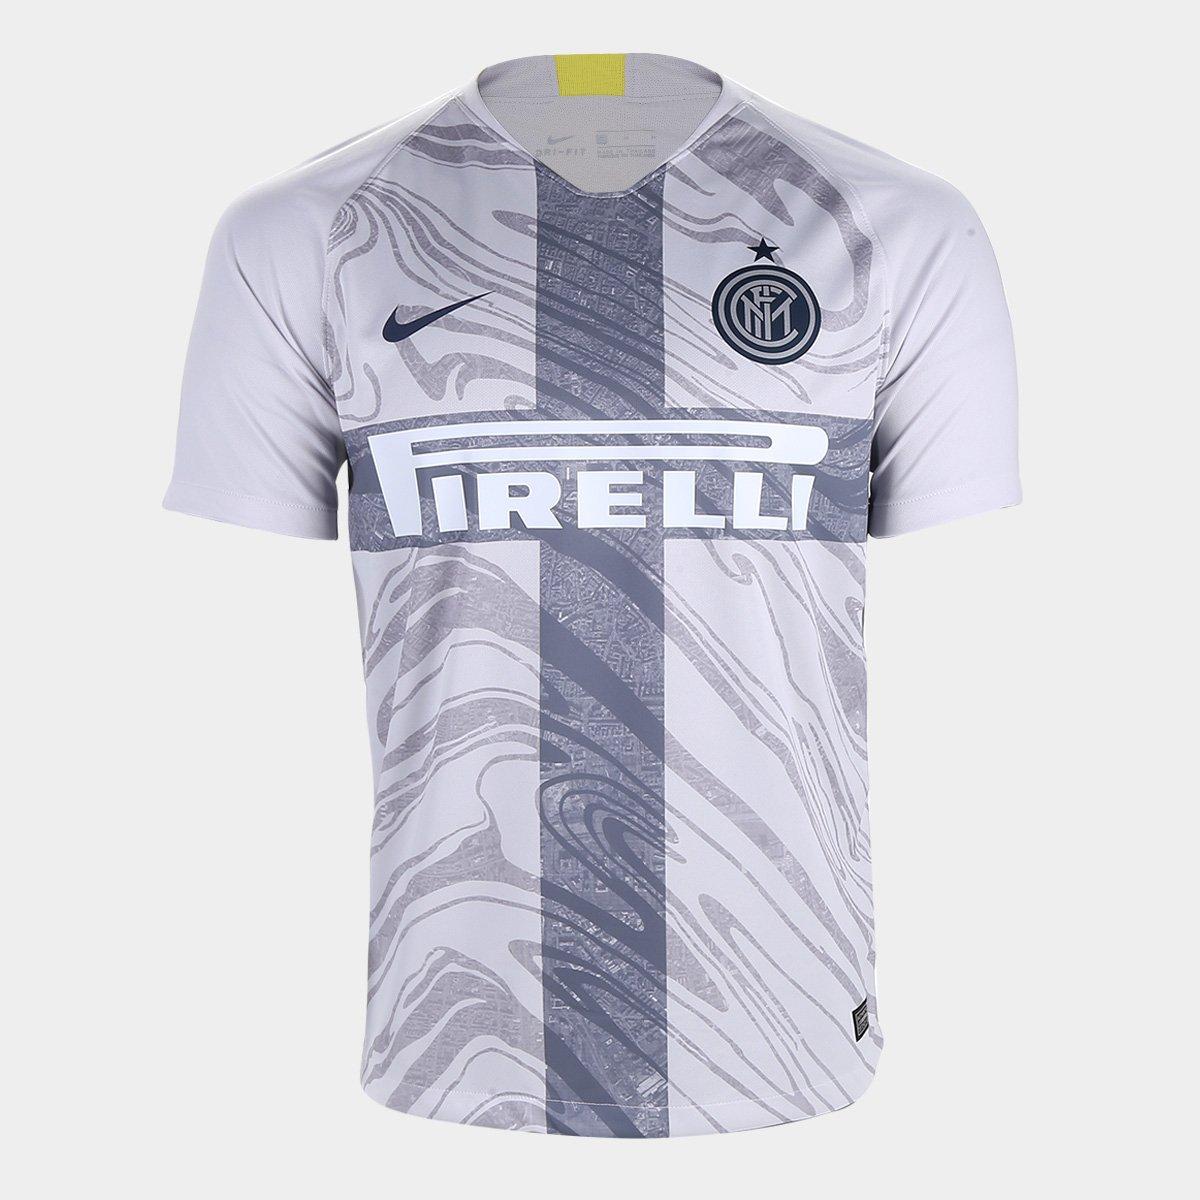 eeb0b7a971d83 Camisa Inter de Milão Third 2018 s n° - Torcedor Nike Masculina - Cinza -  Compre Agora